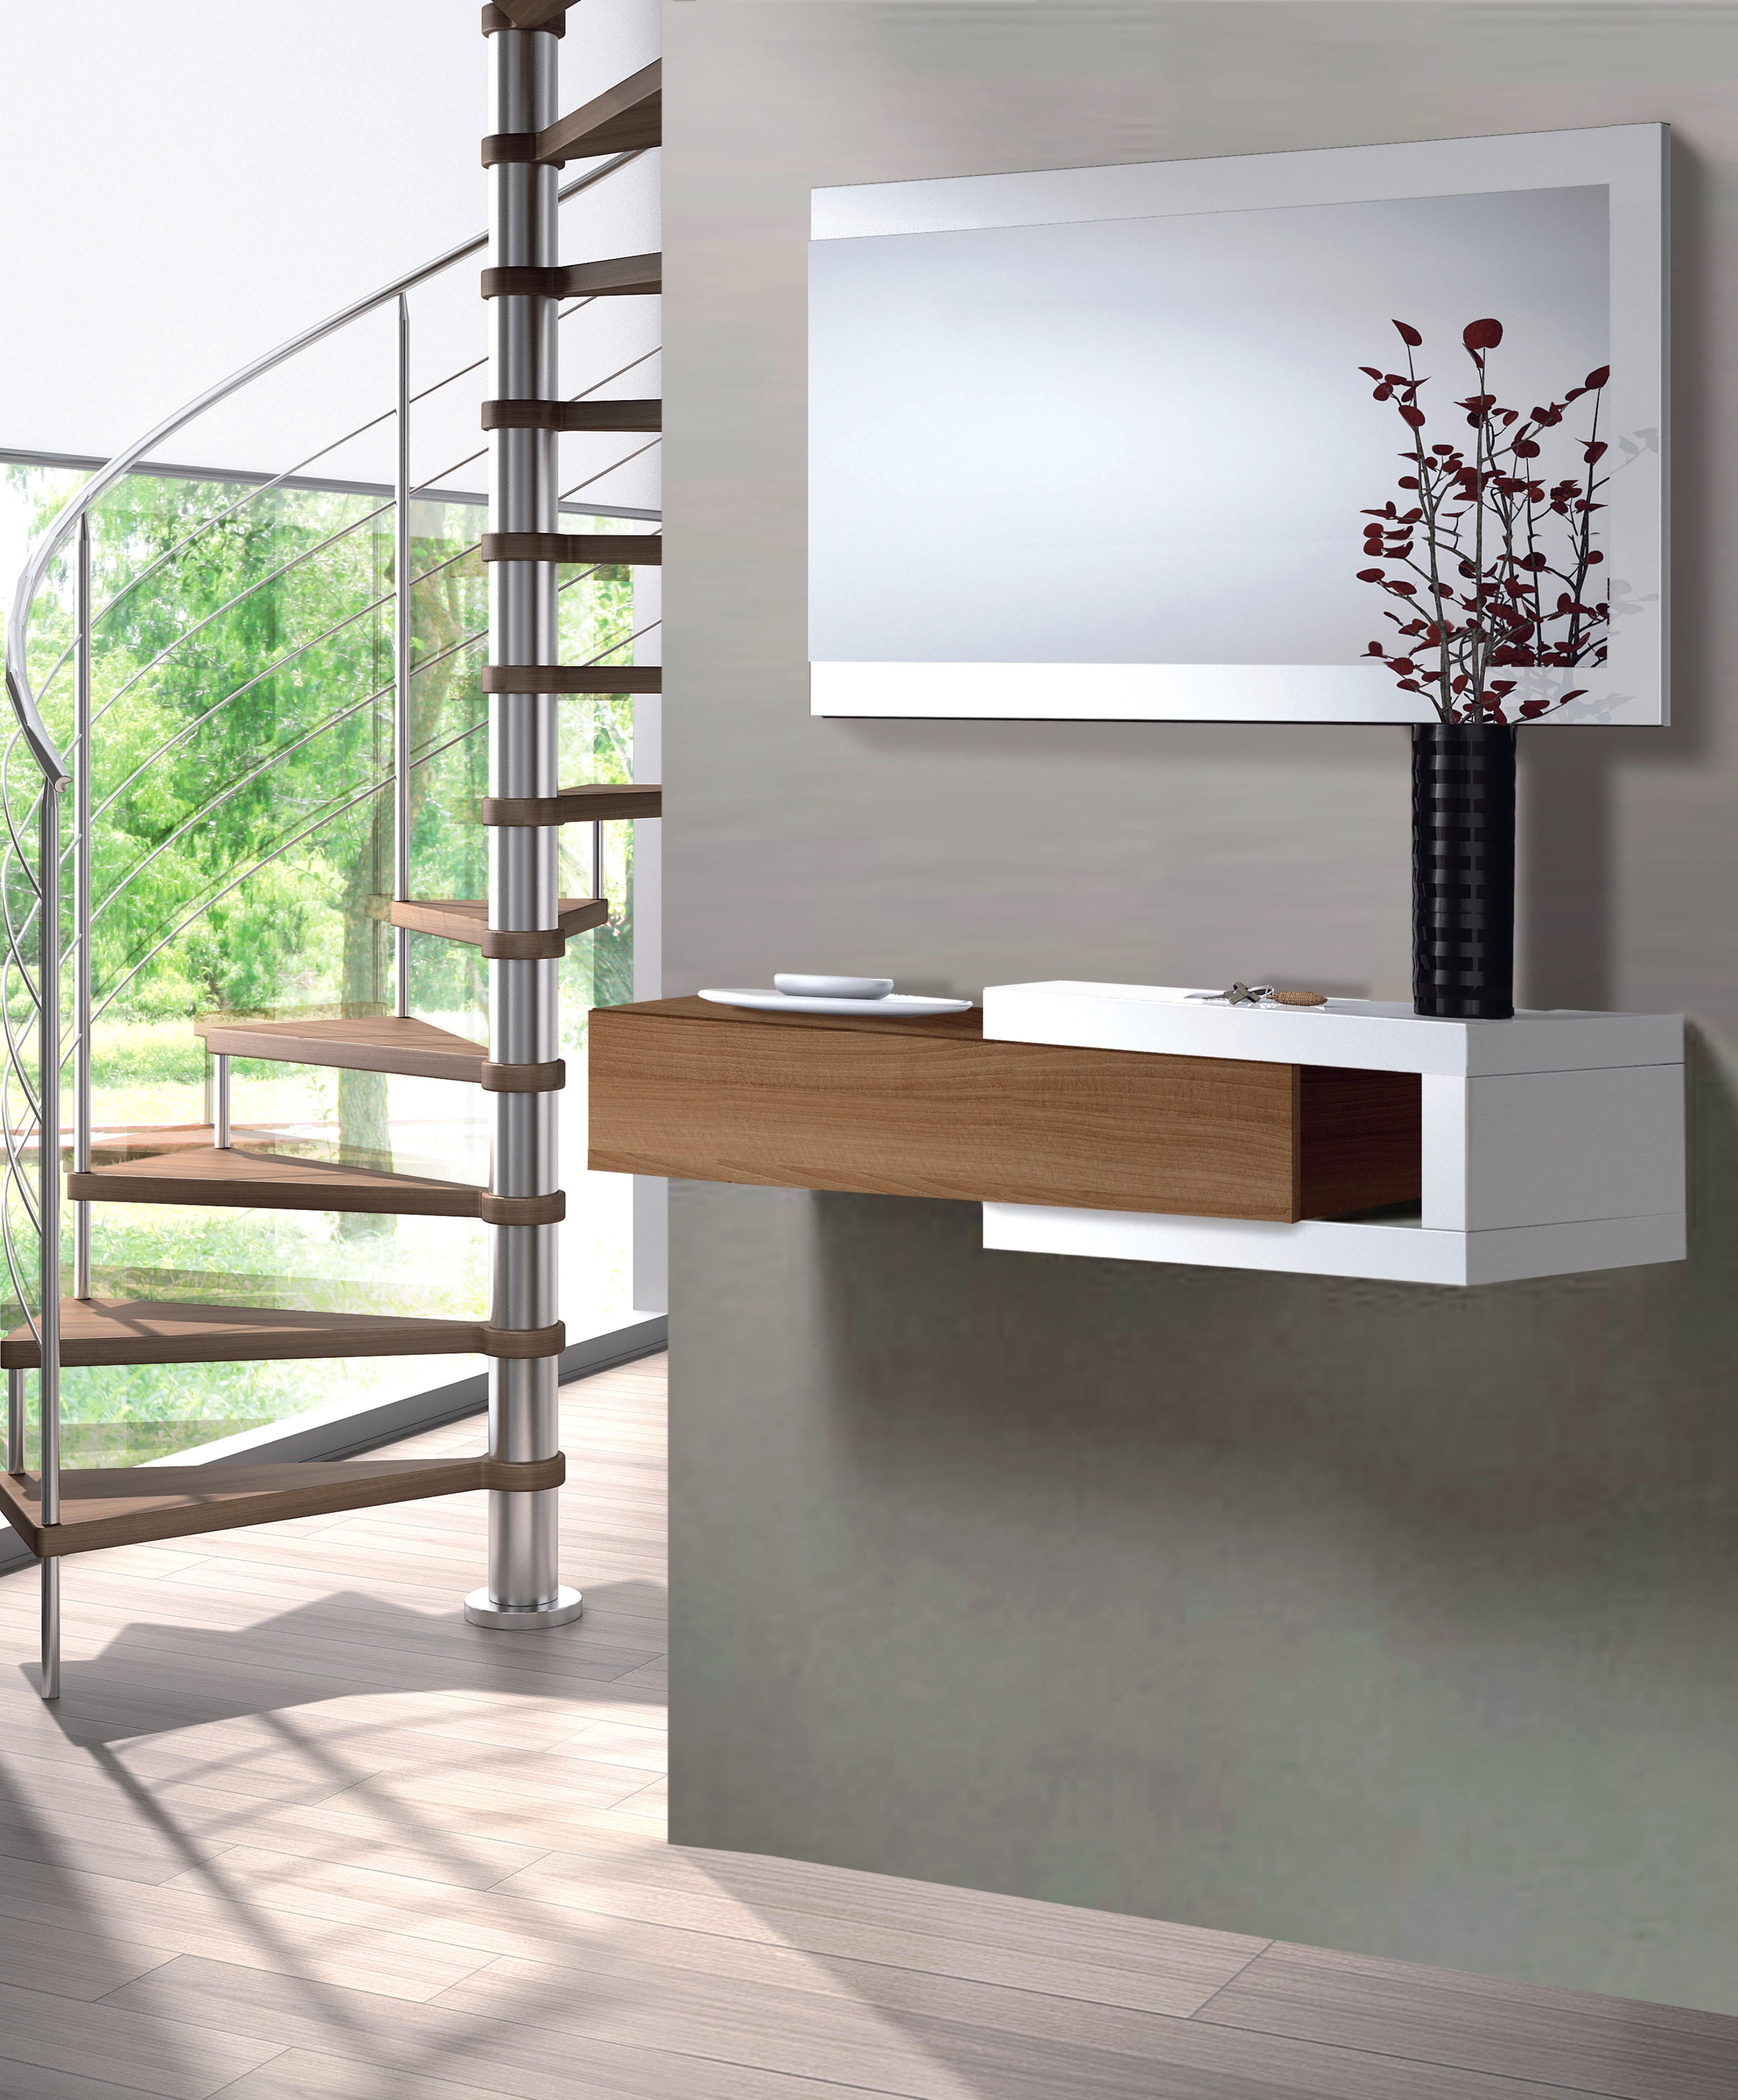 Muebles recibidor - ShareMedoc